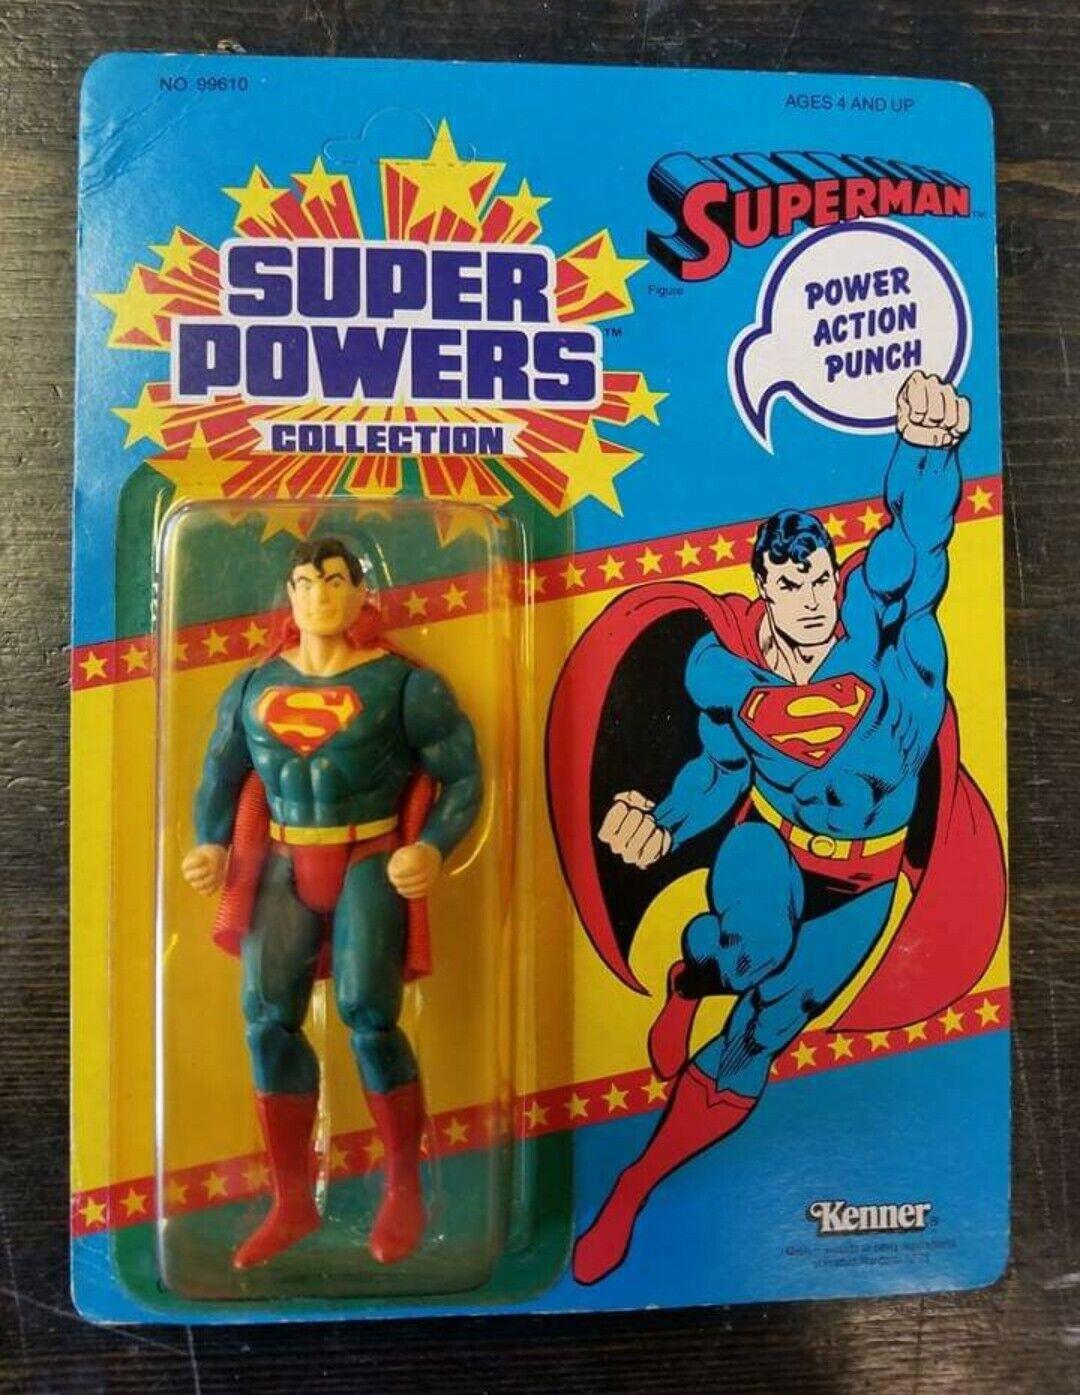 Kenner súper poderes Superman 33-Back 3rd serie offerless Australia Vintage 1986